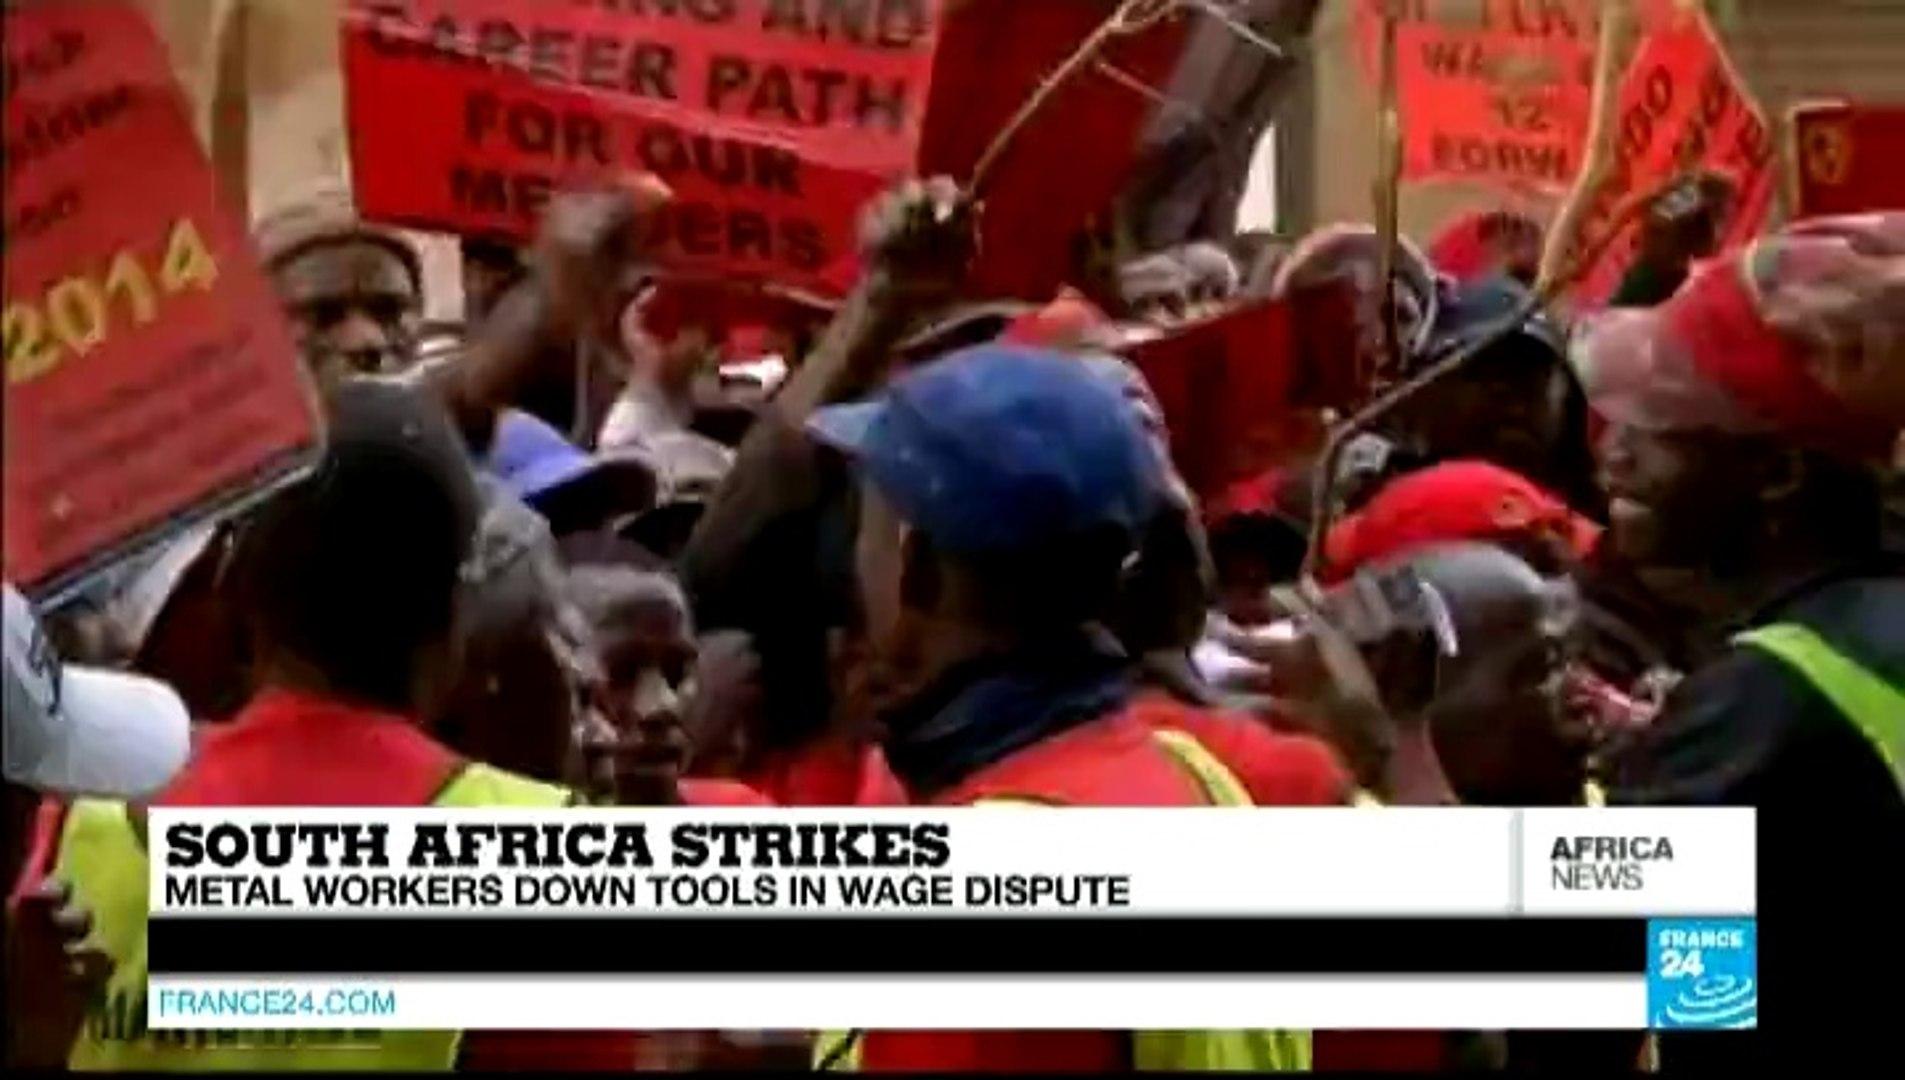 AFRICA NEWS - Ebola virus in West Africa: Fear undermines Sierra Leone's reponse